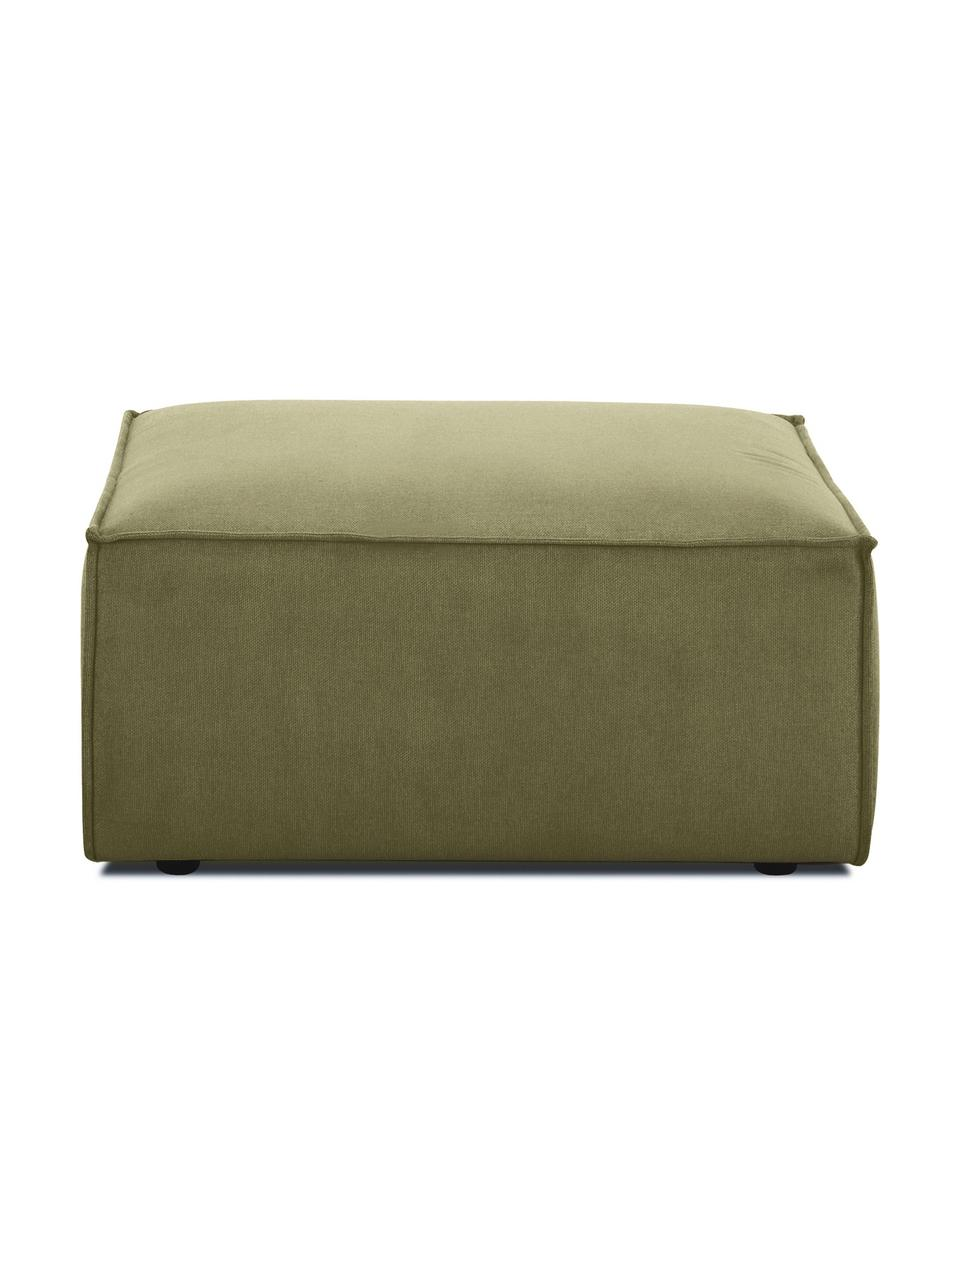 Pouf canapé vert Lennon, Tissu vert